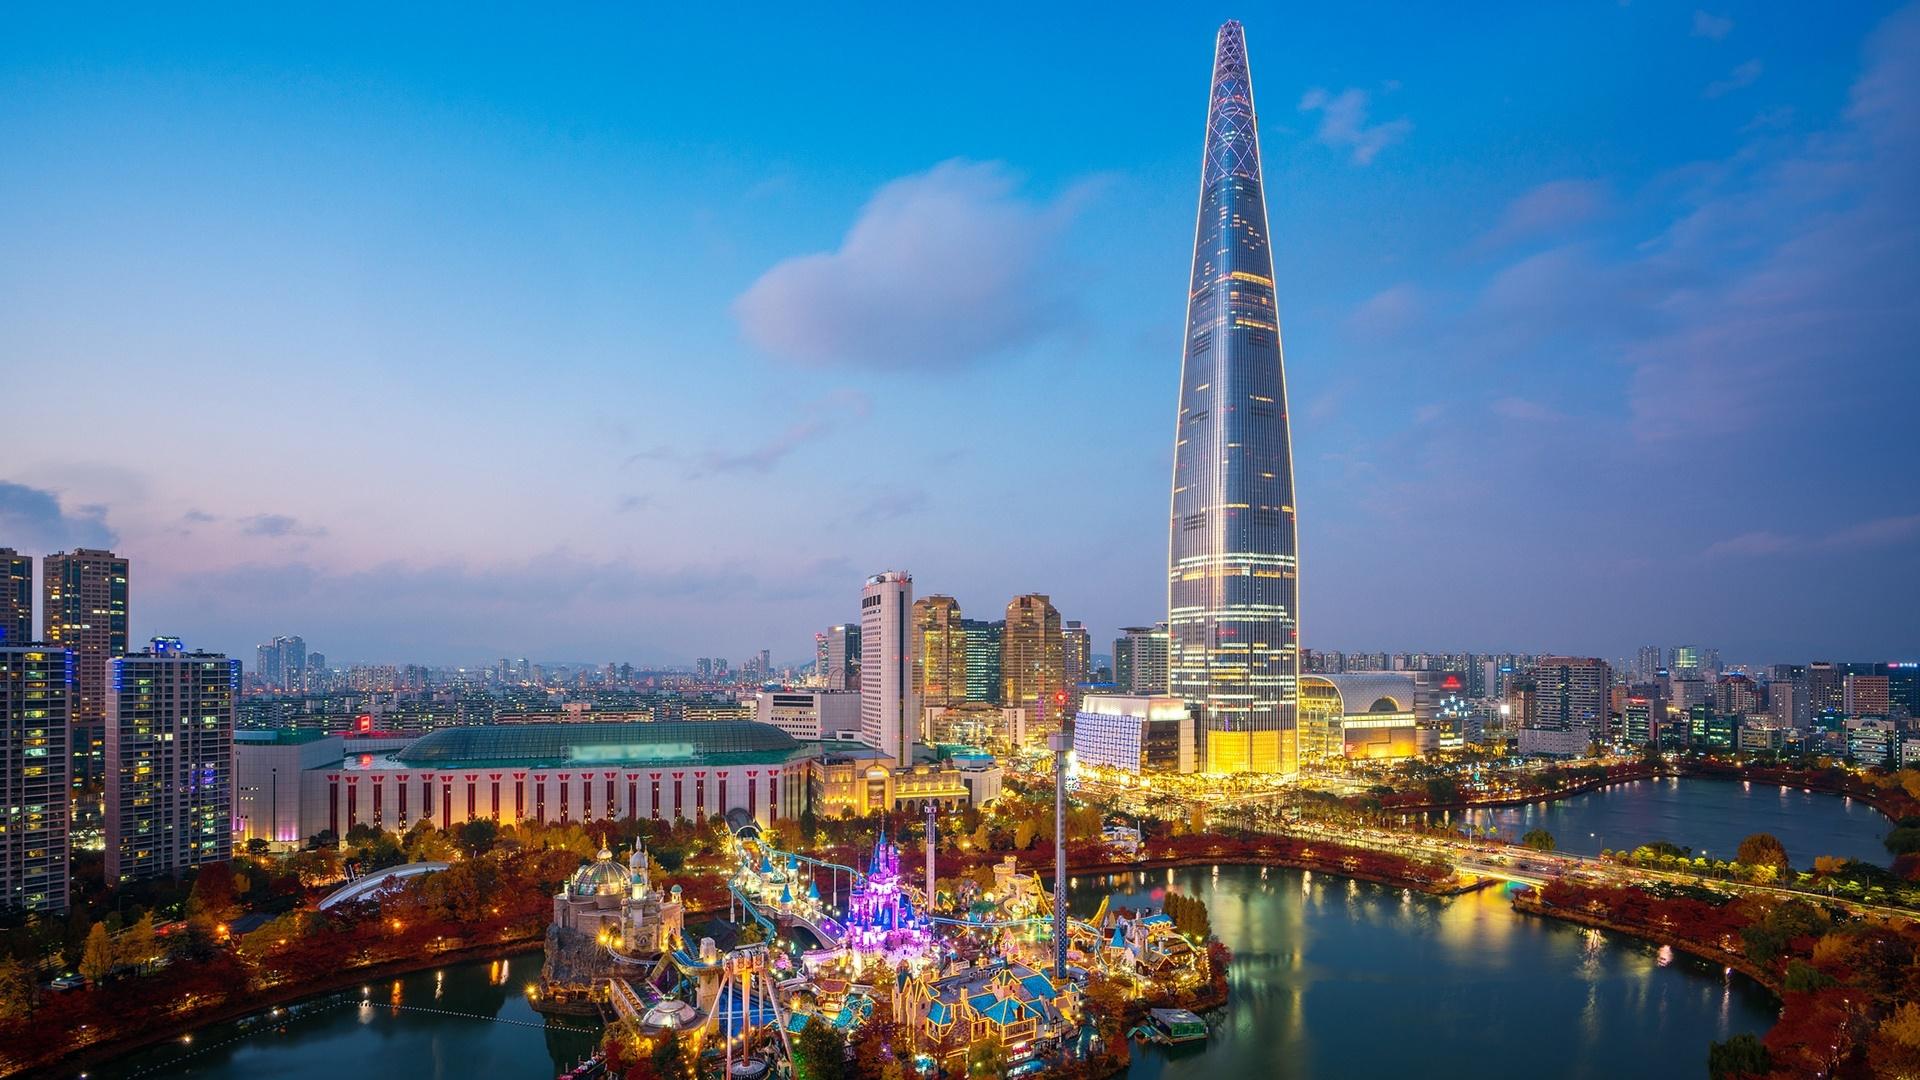 Lotte World Tower in Seoul wallpaper